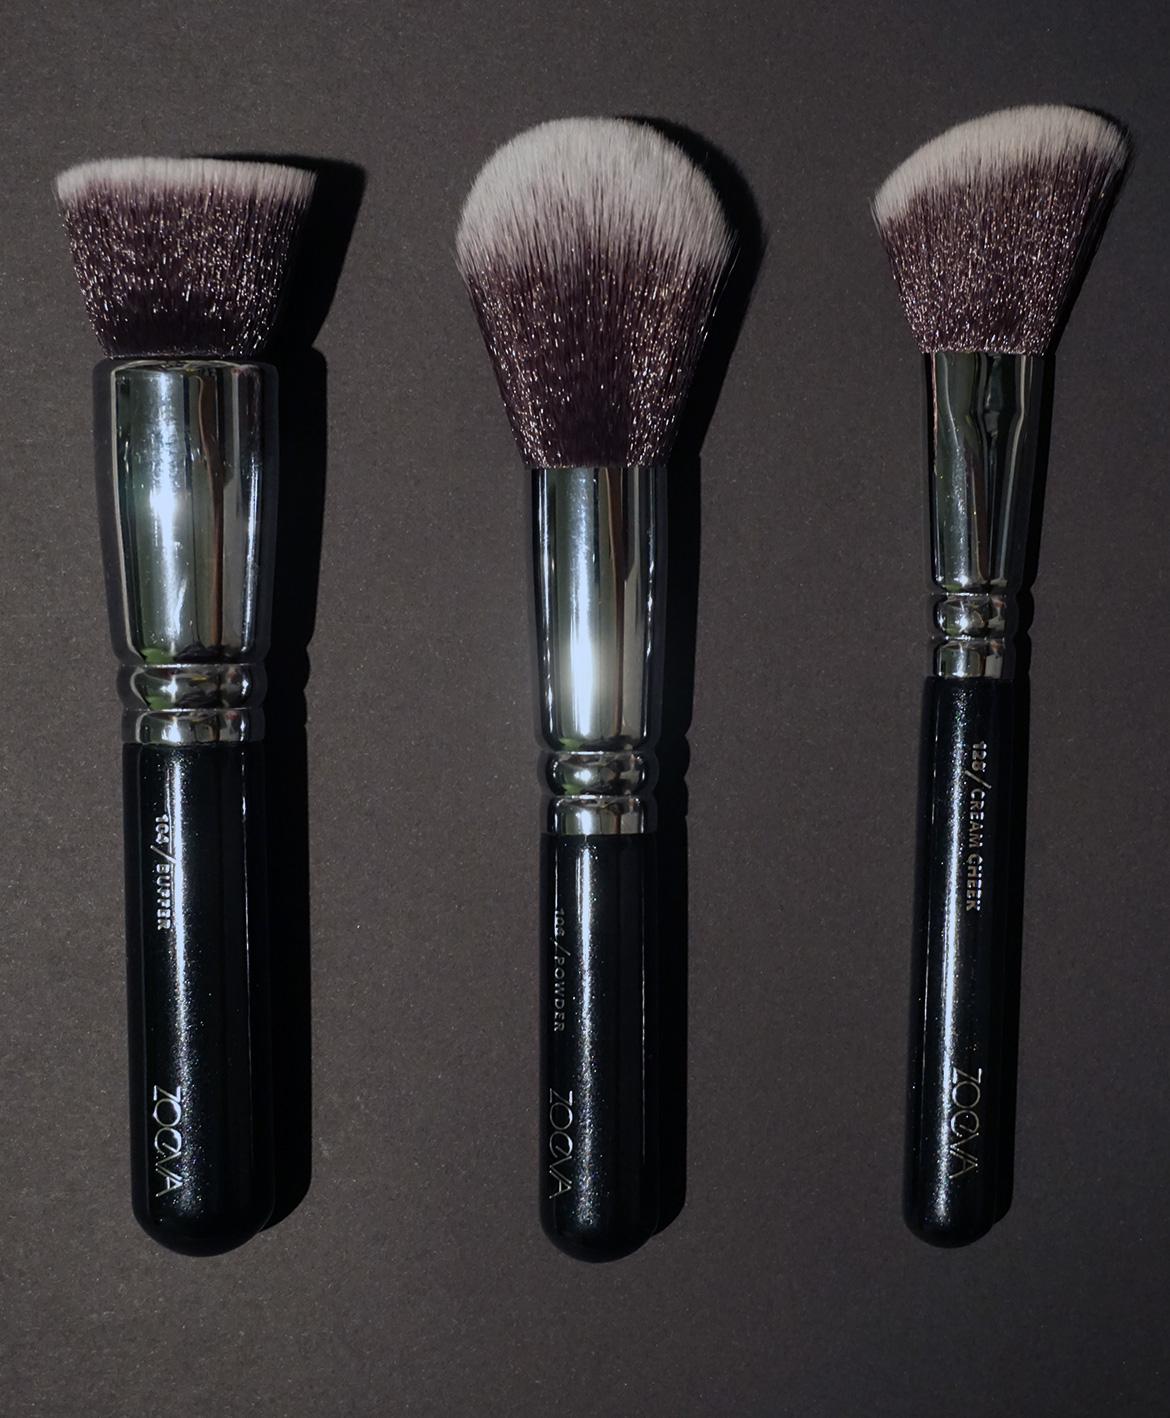 104 / Buffer - 105 / Powder - 128 / Cream Cheek